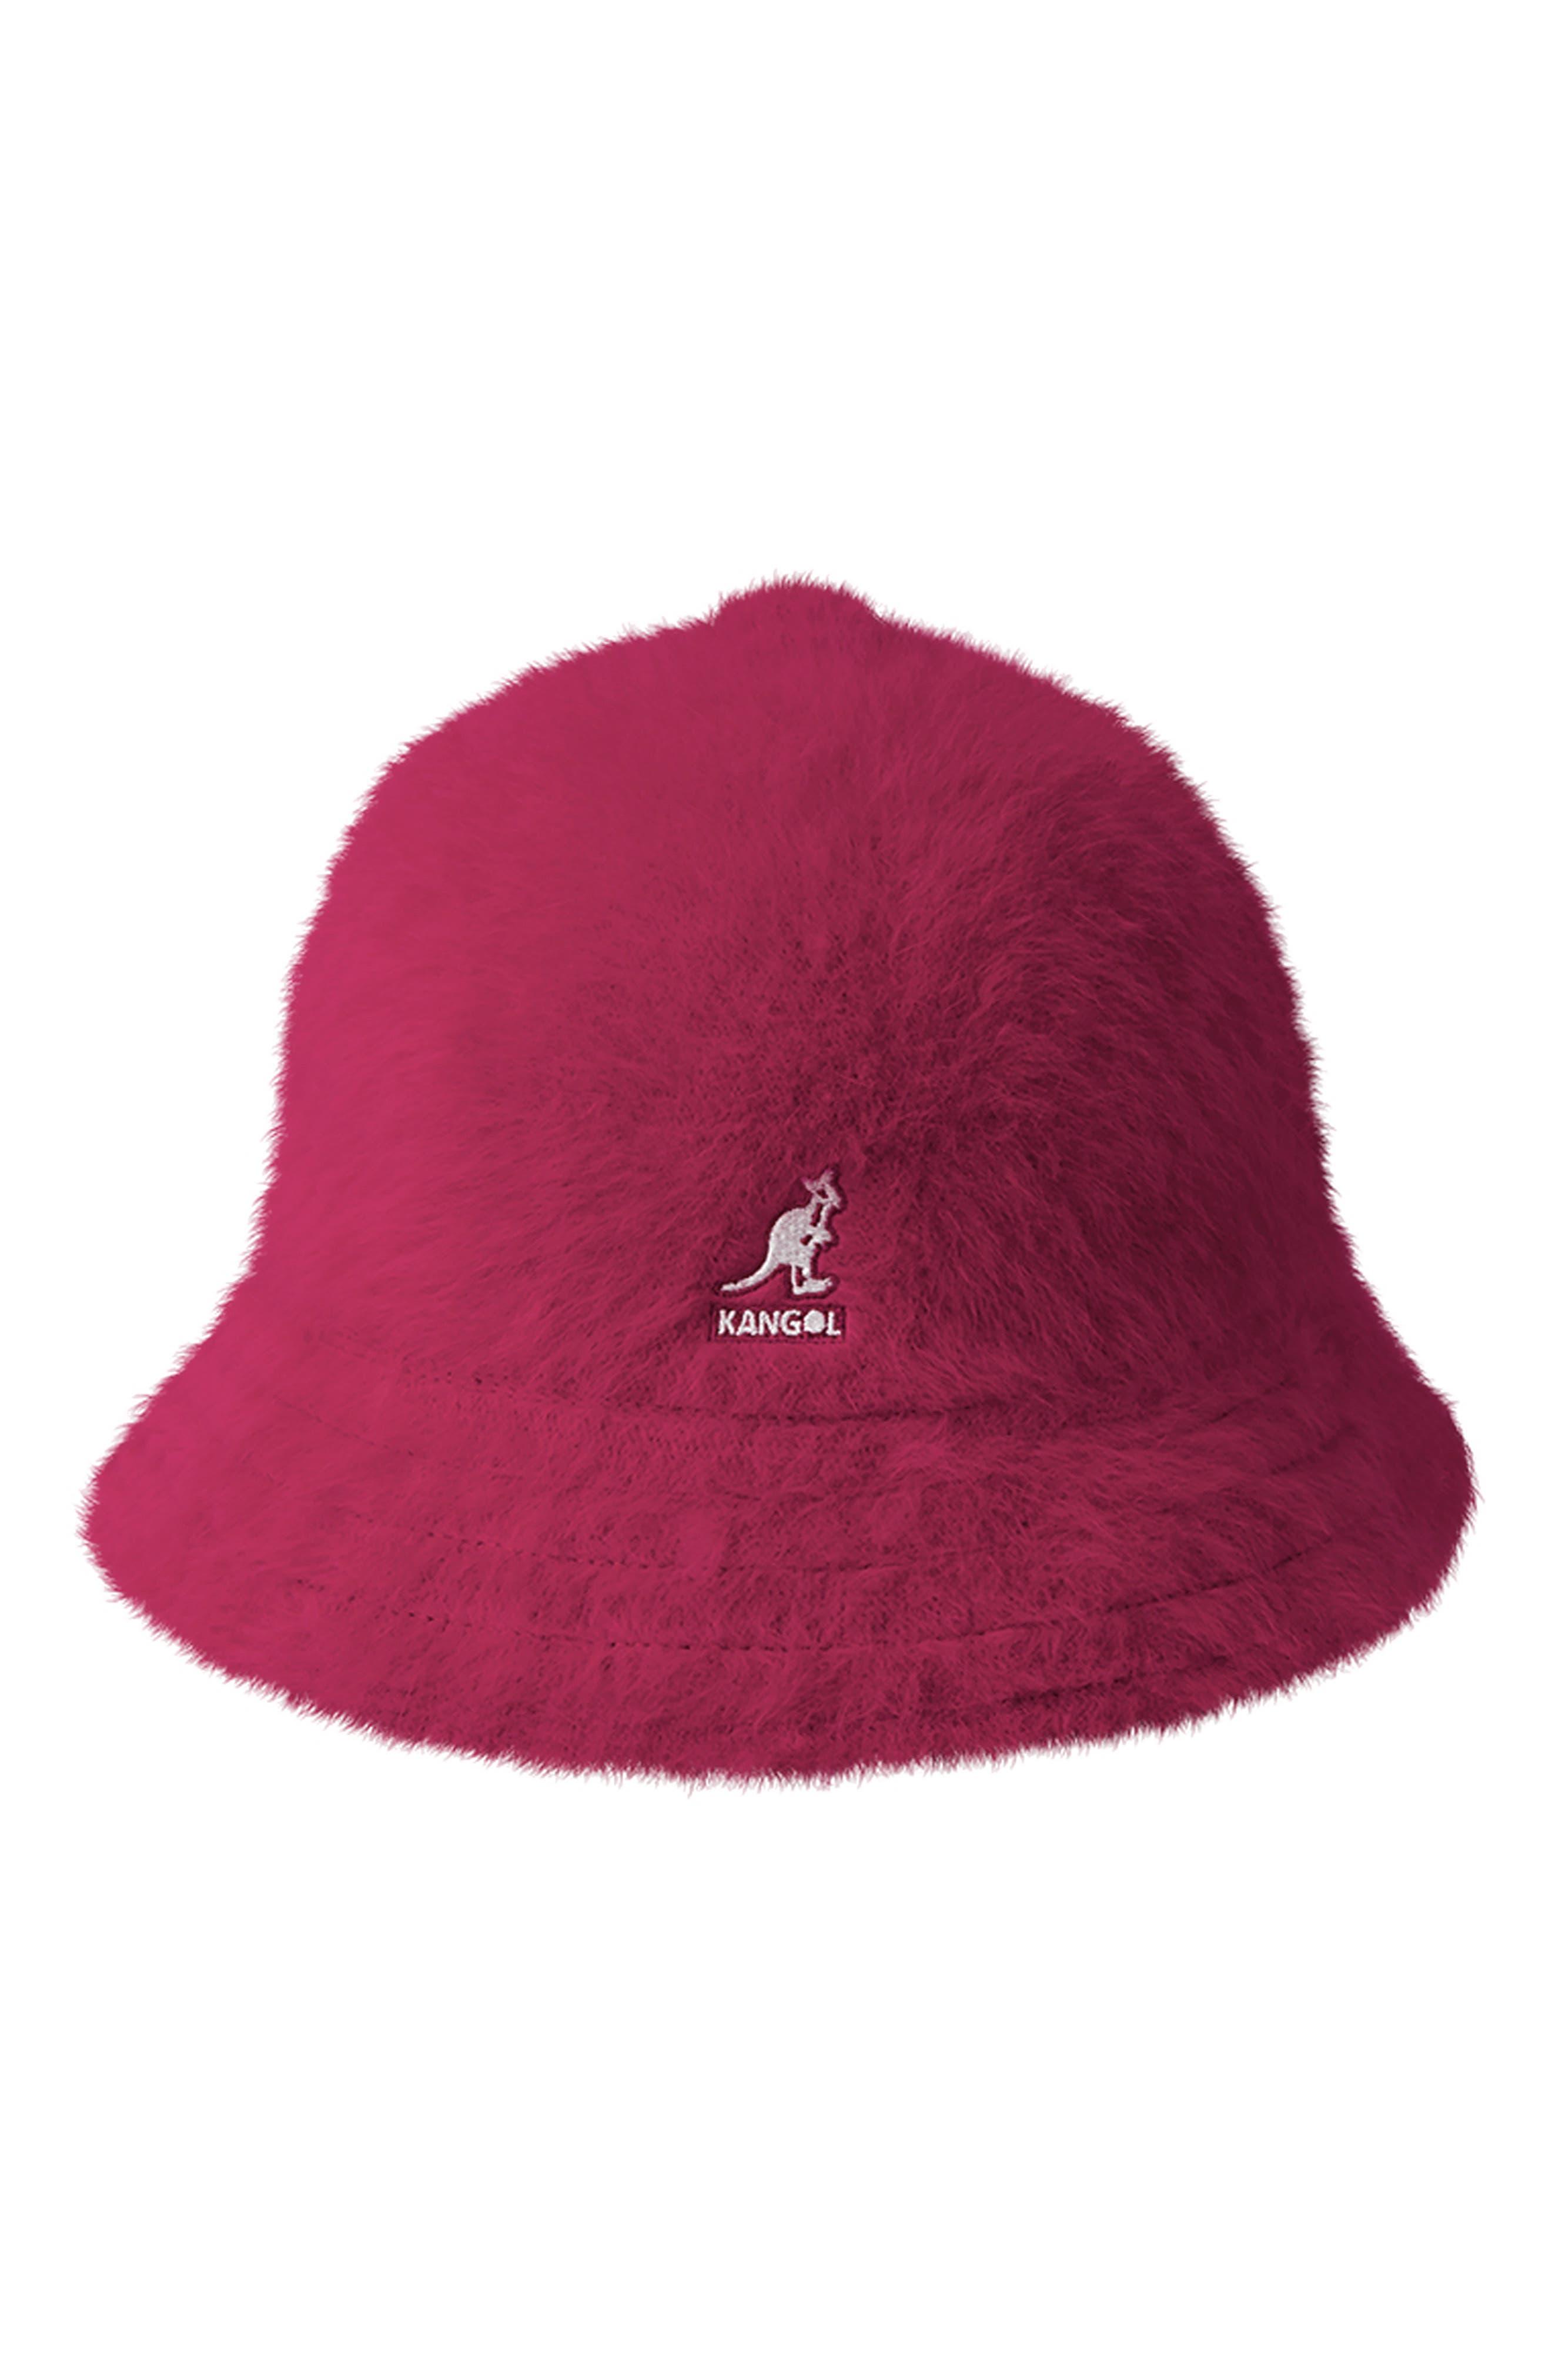 KANGOL Furgora Casual Bucket Hat - Pink in Garnet